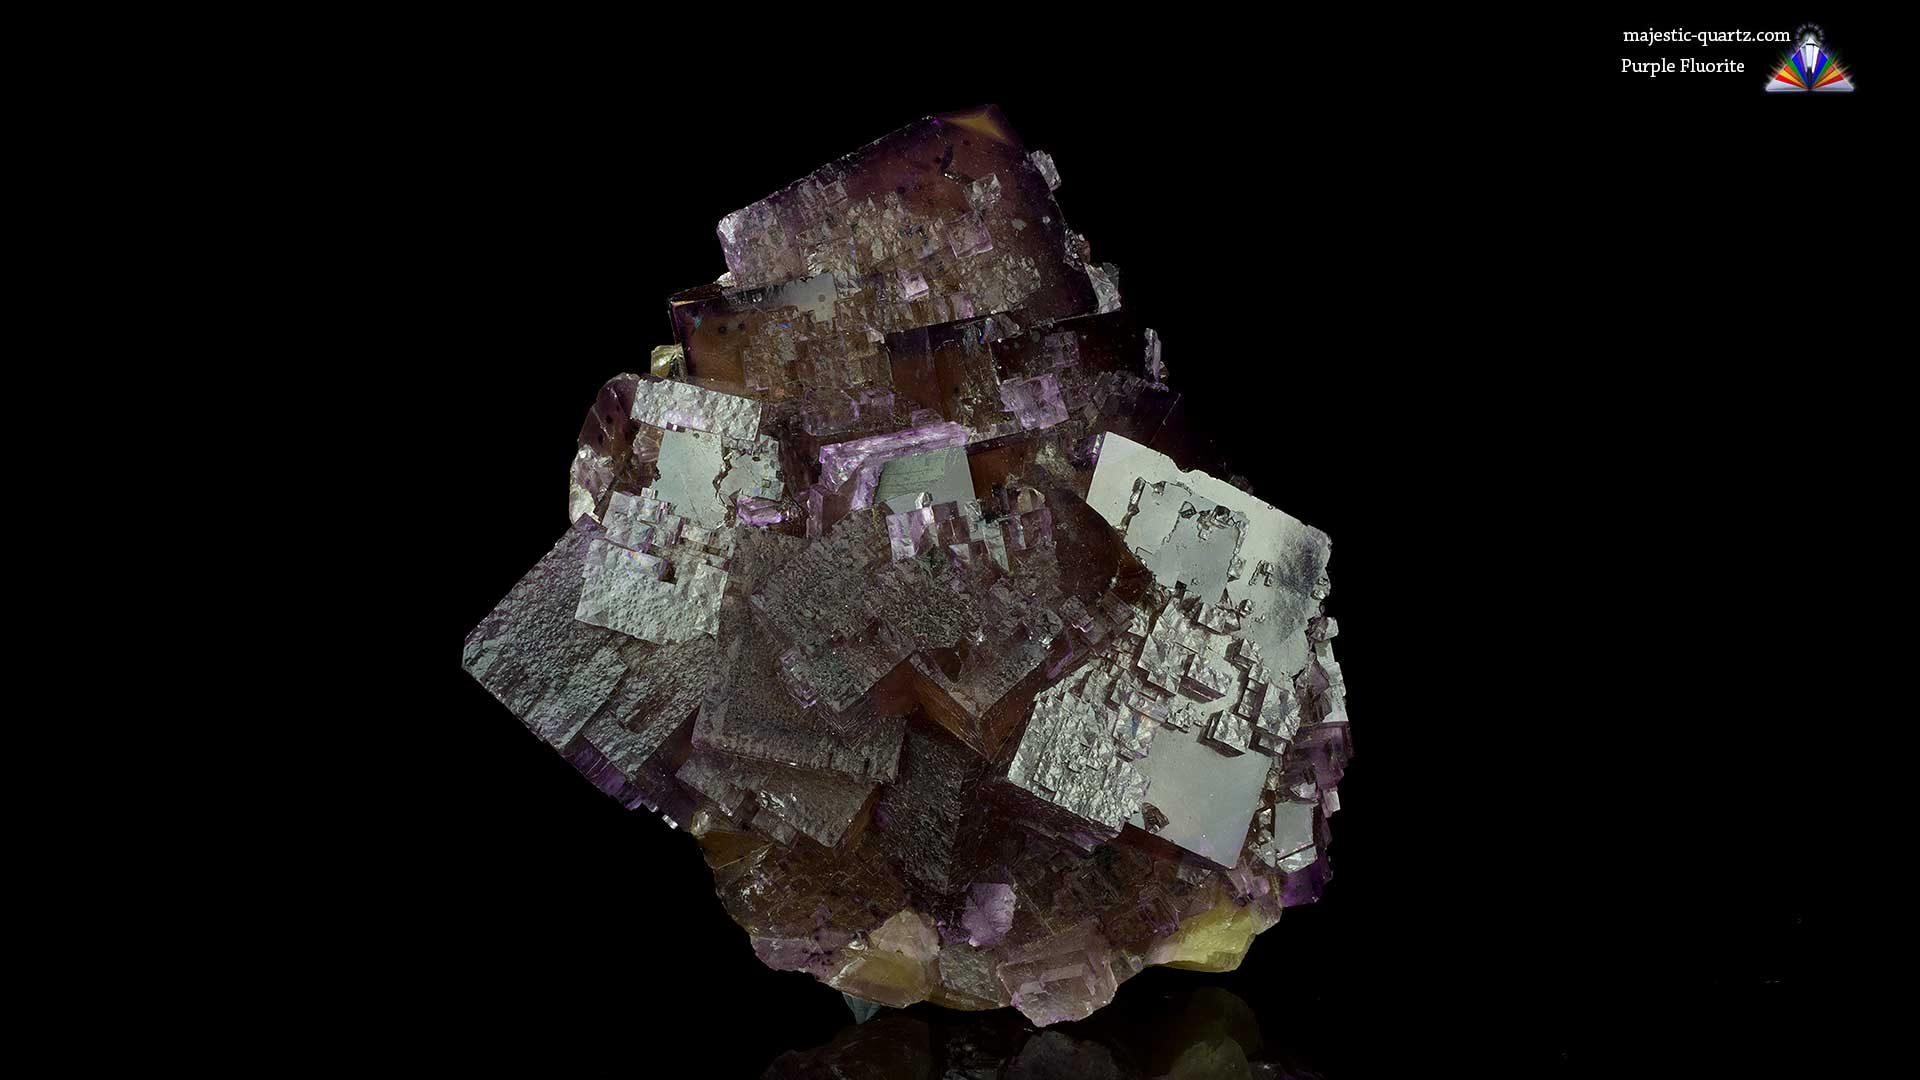 Purple Fluorite Cluster Crystal/Mineral Specimen